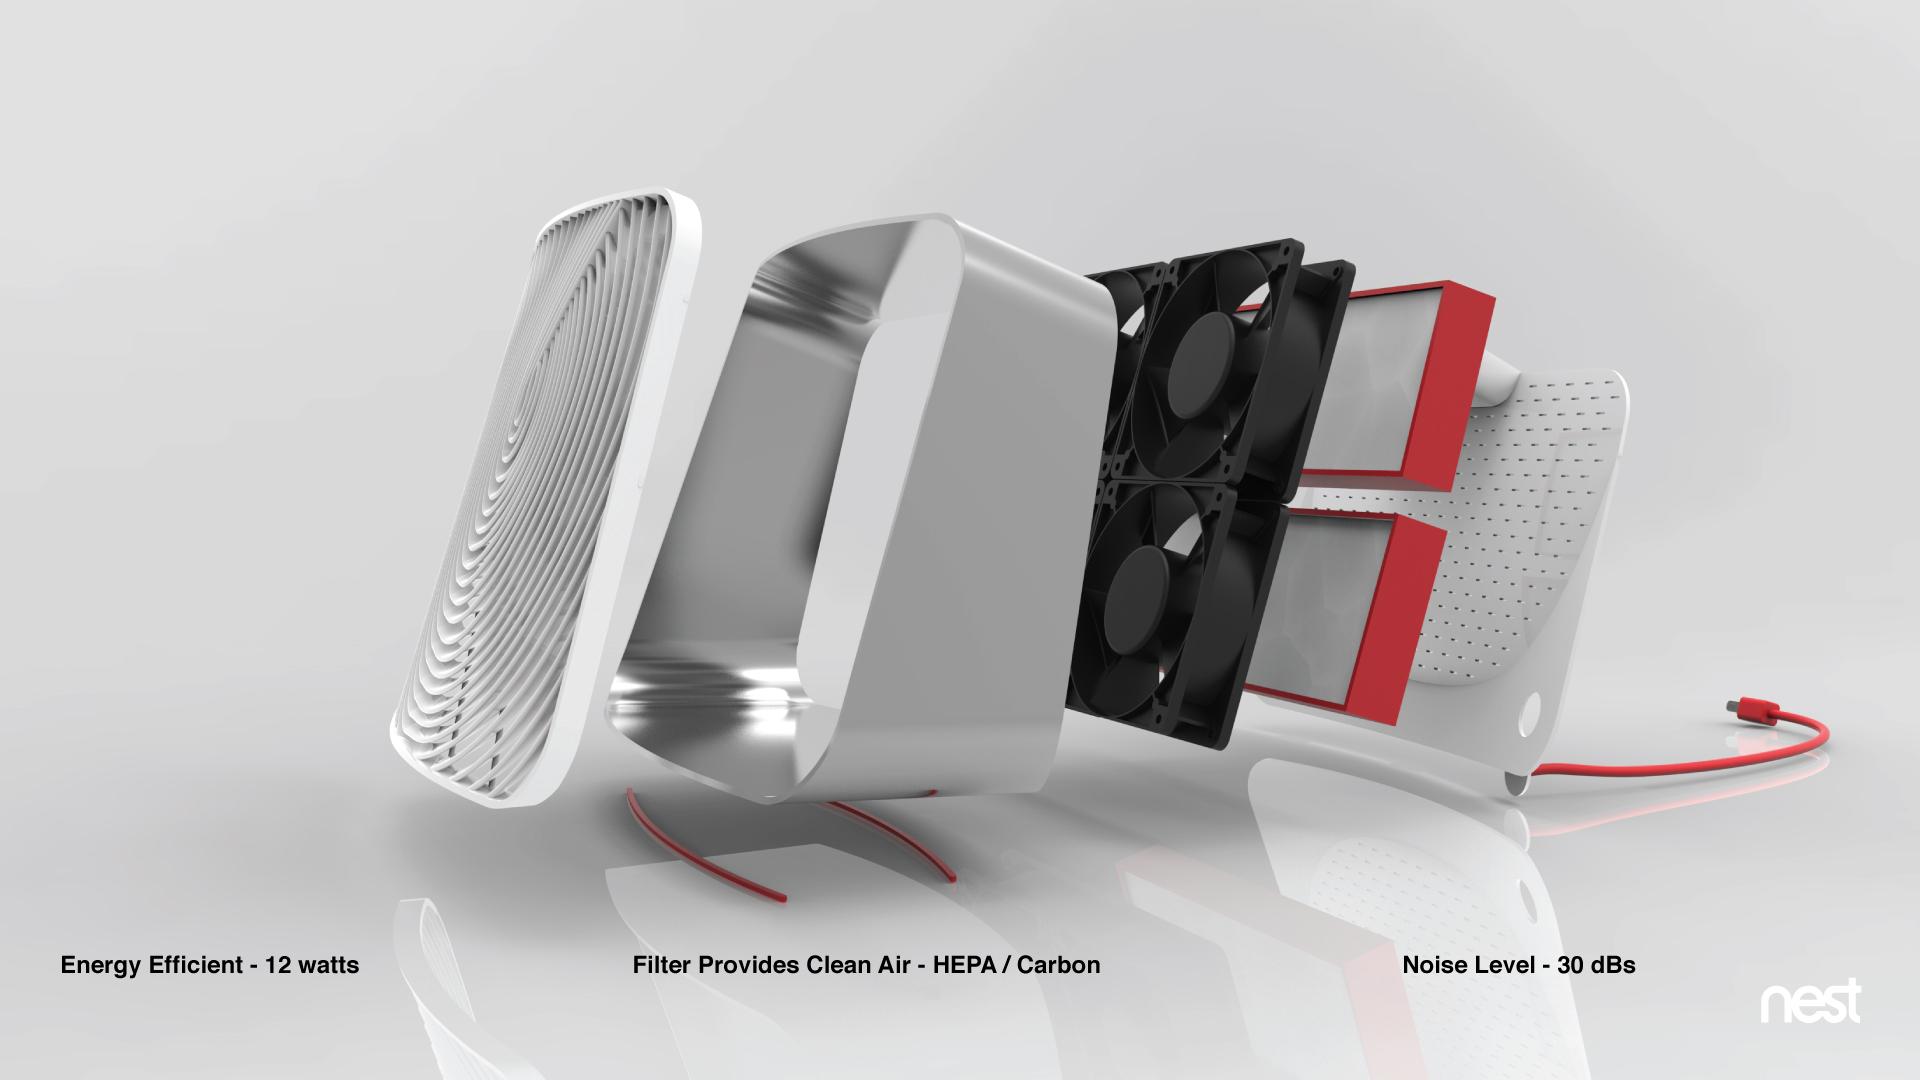 Nest Smart Air Purifer – Evan Howard